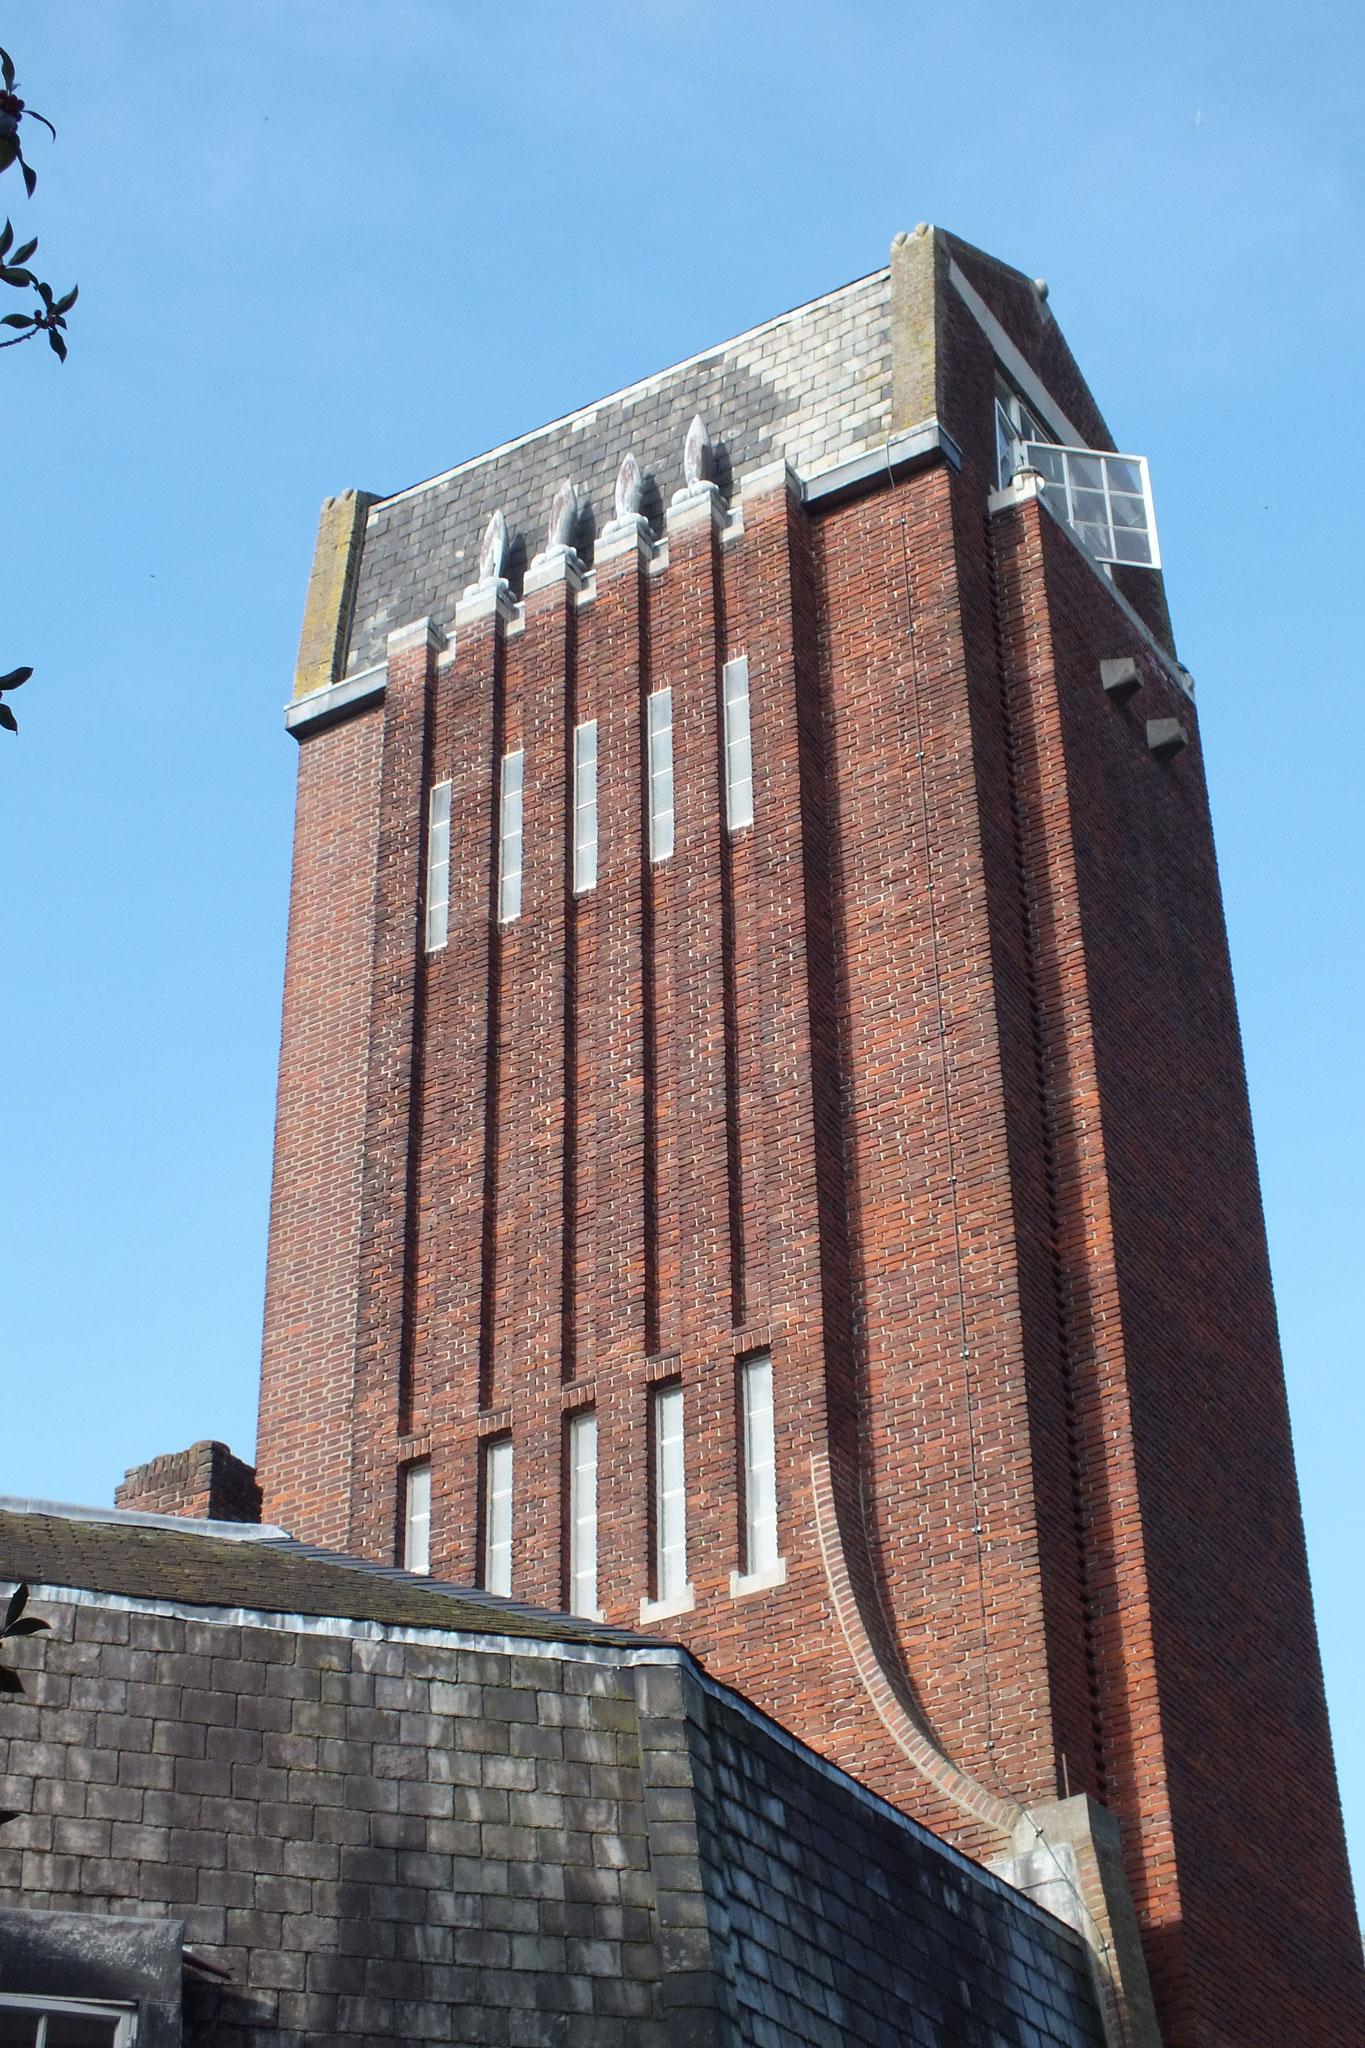 De markante toren met loden ornamenten